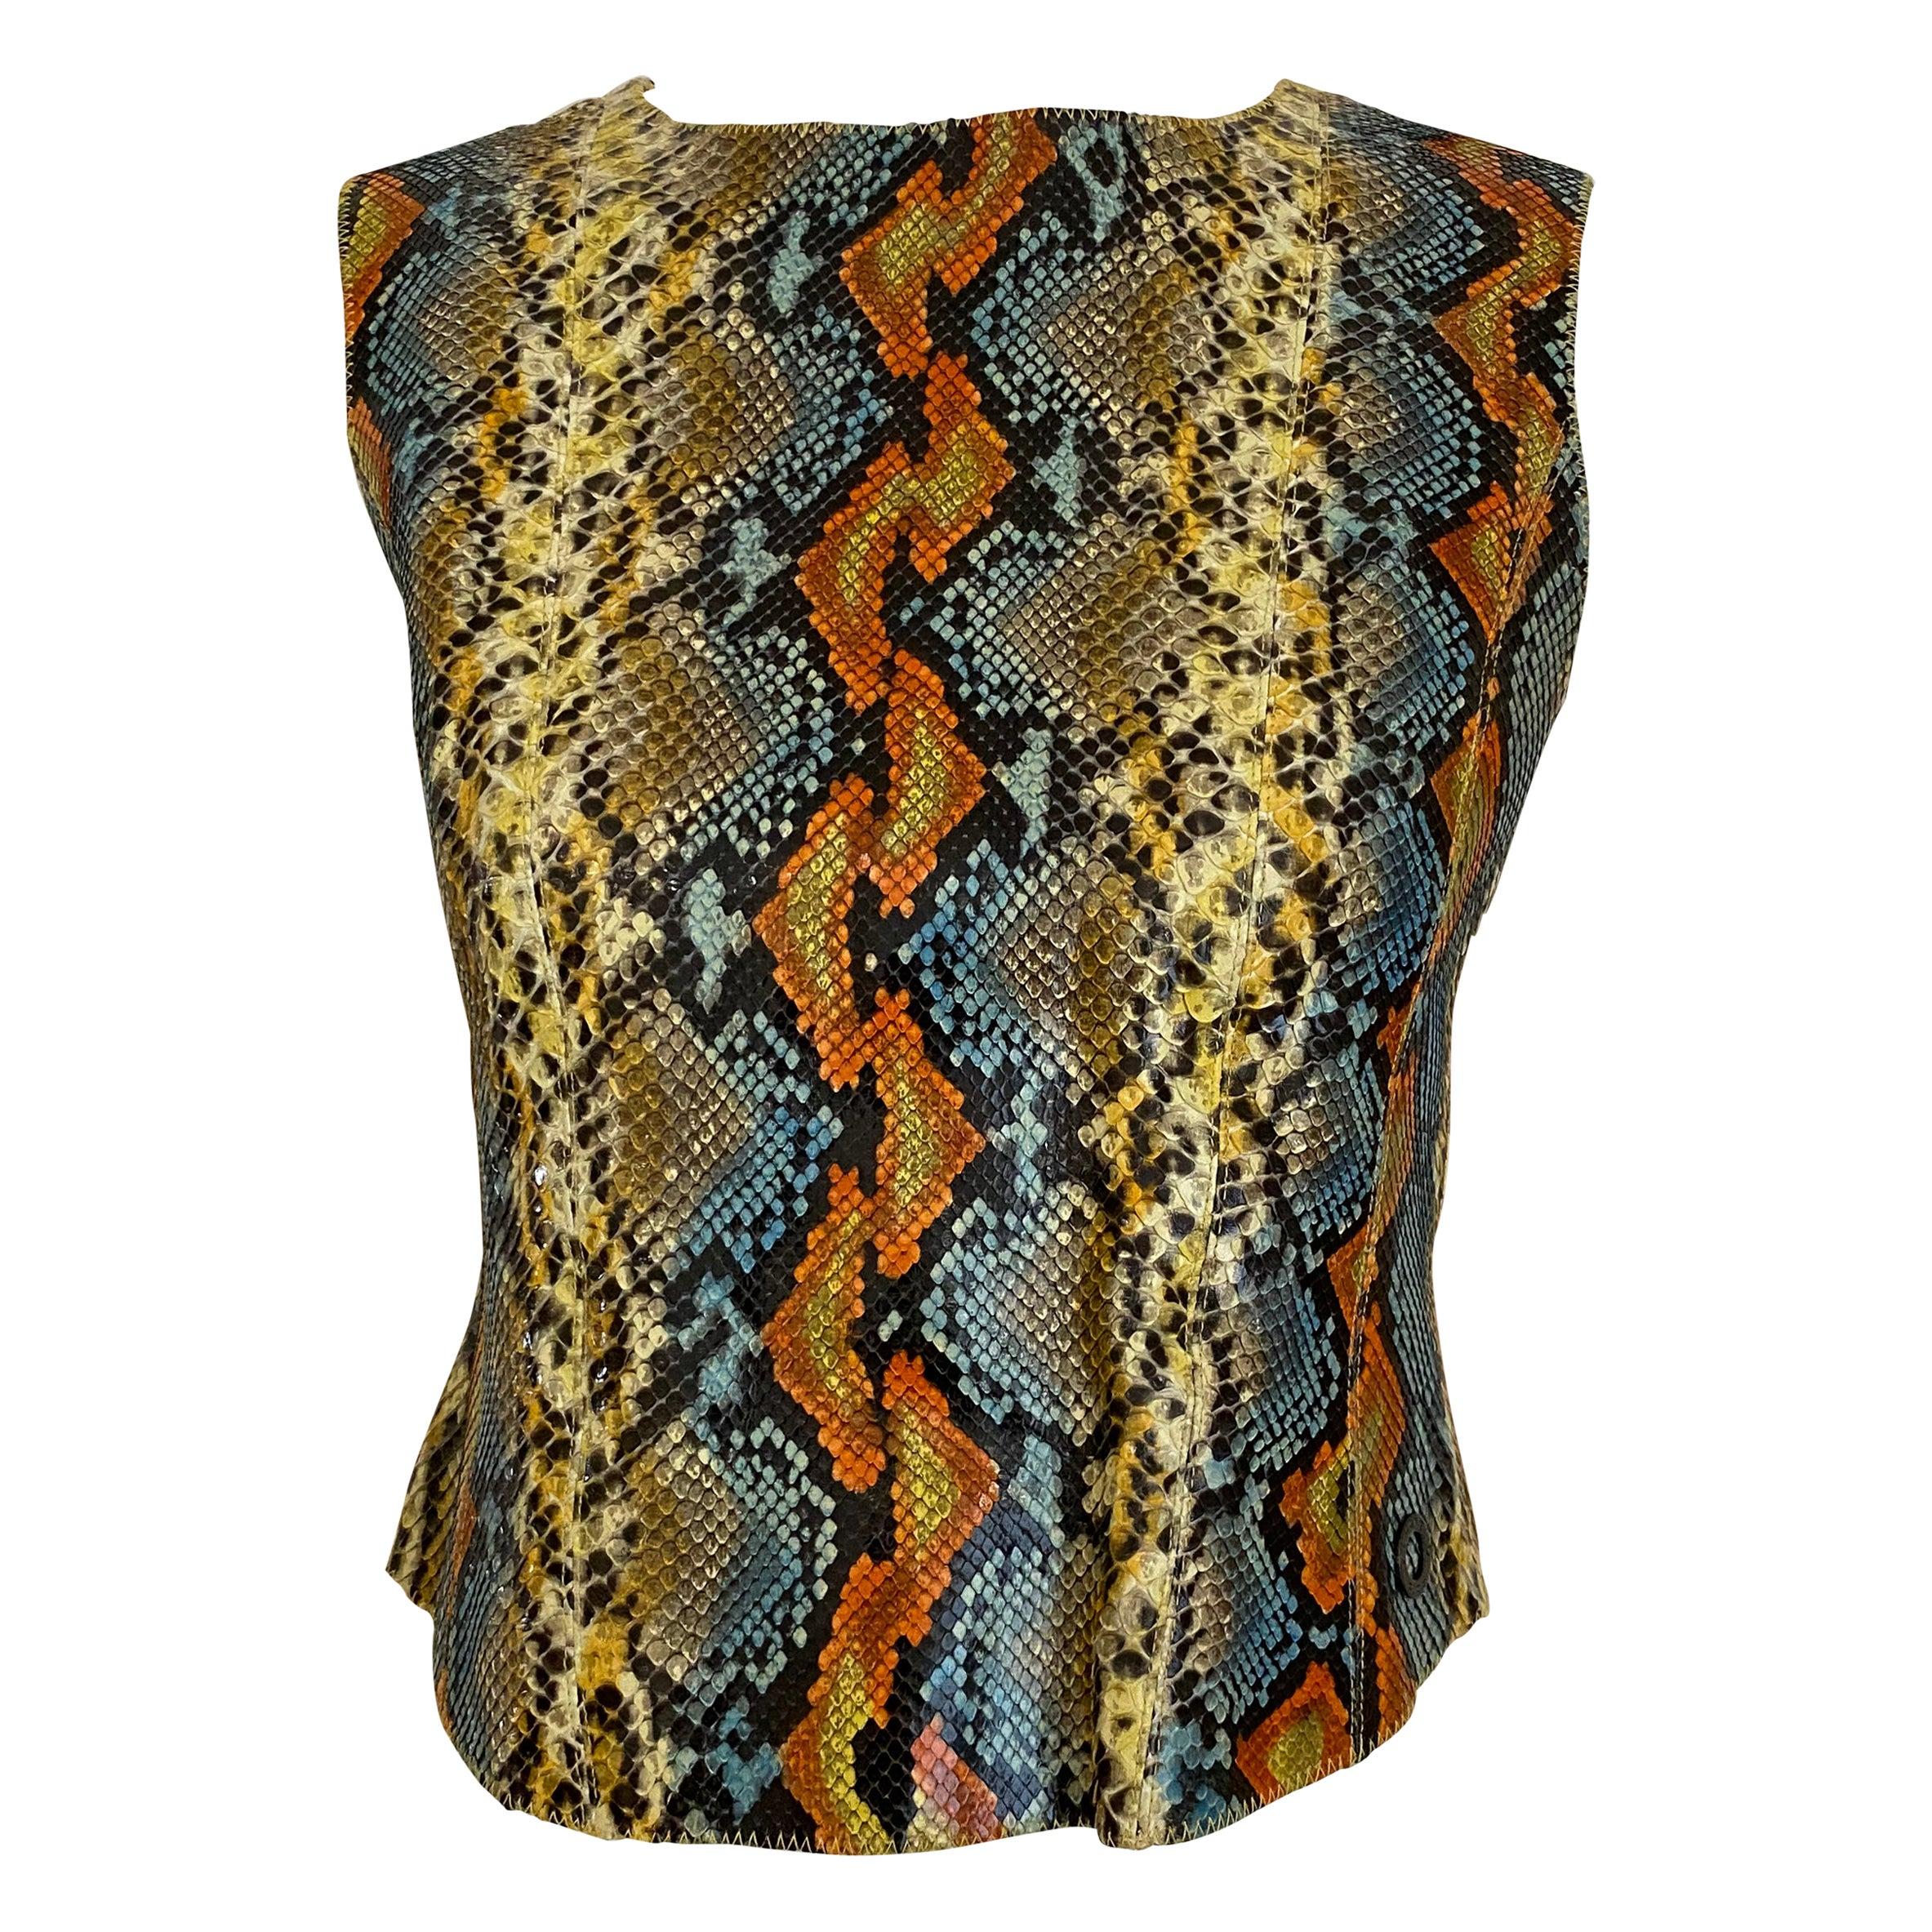 Vintage CHANEL Multi Color Snake Skin Sleeveless Top